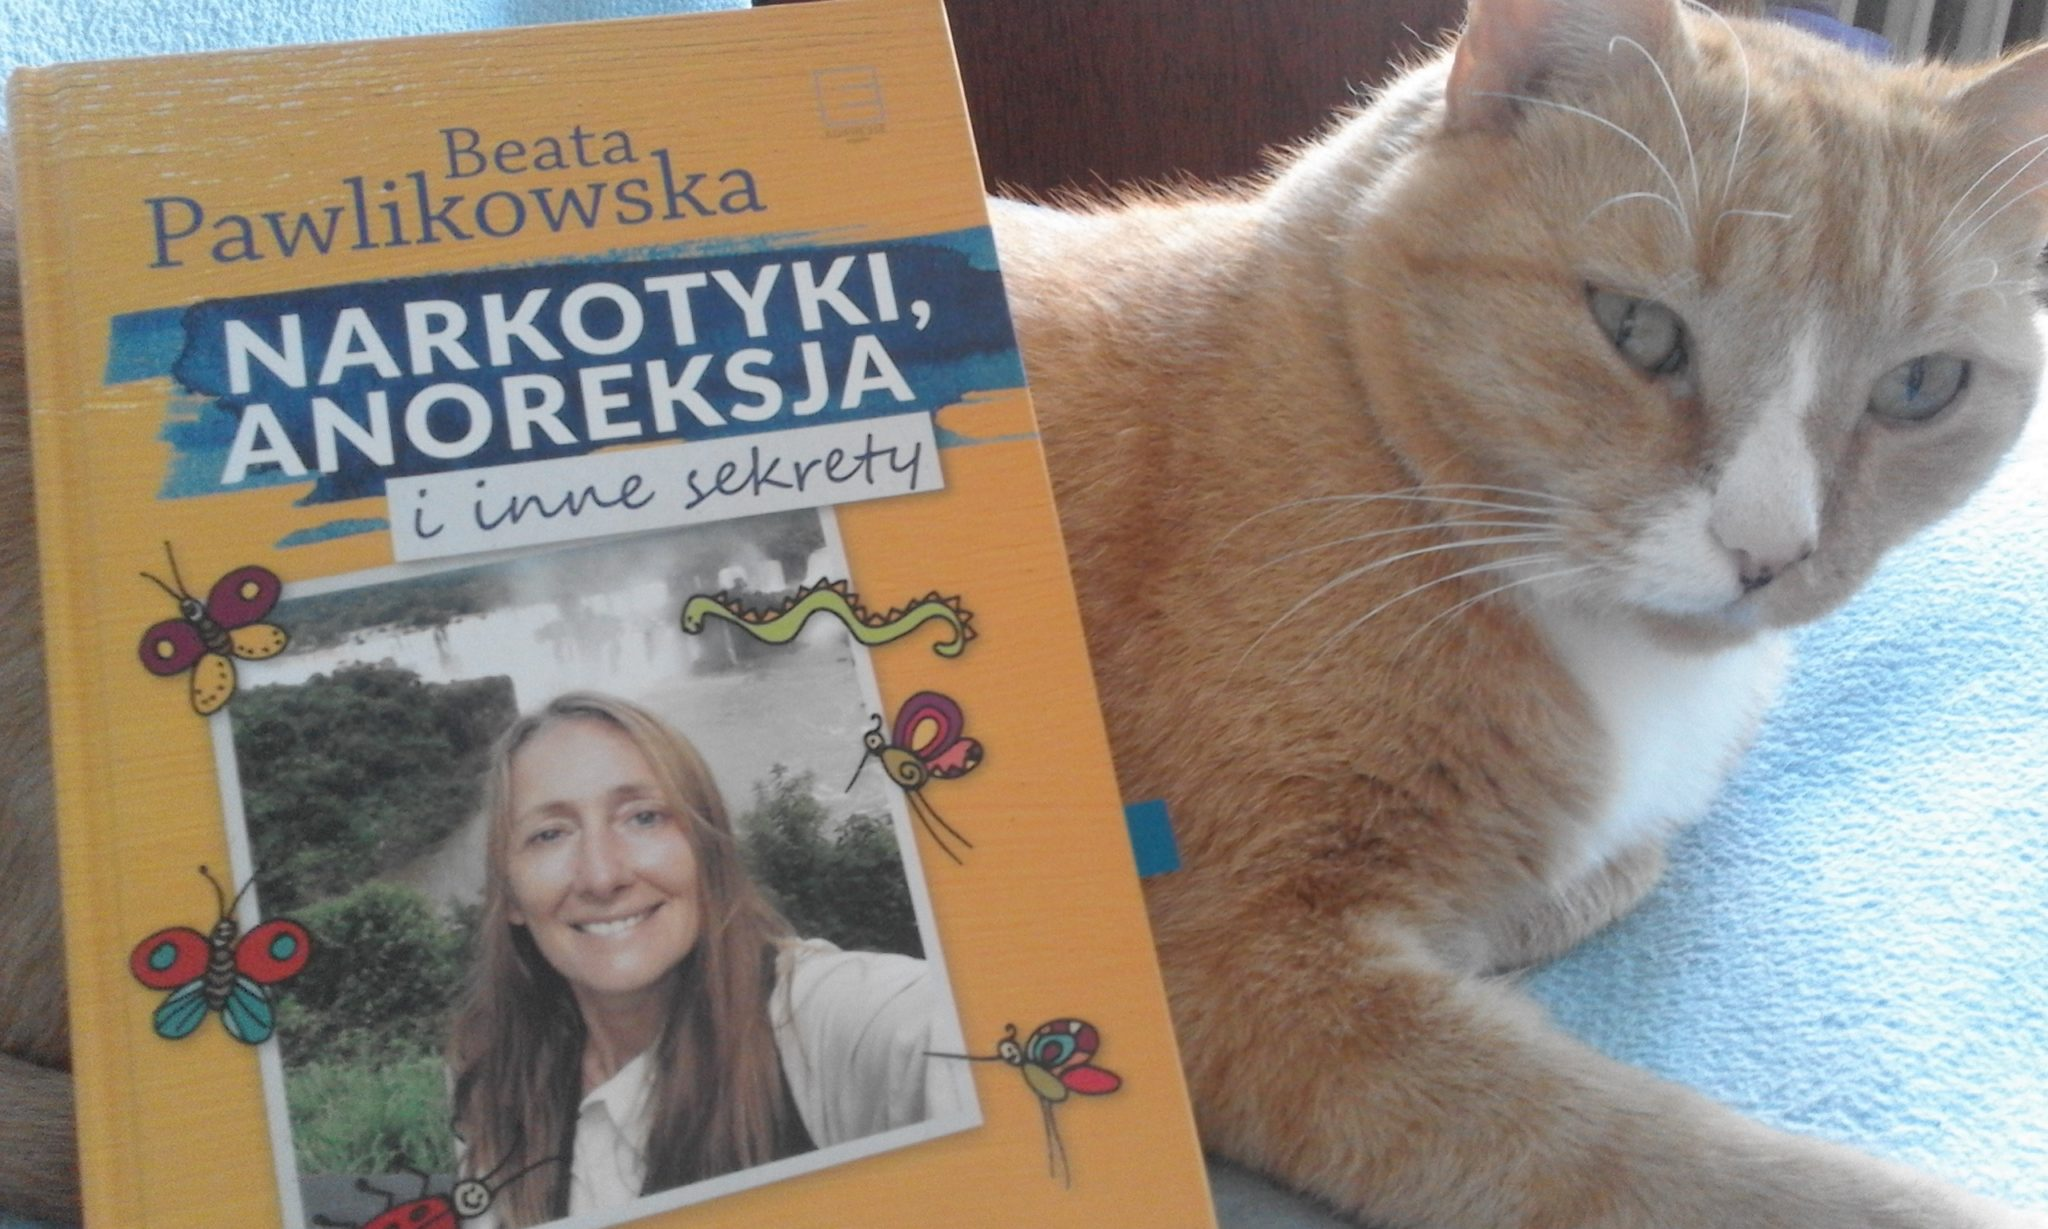 Beata Pawlikowska Anoreksja